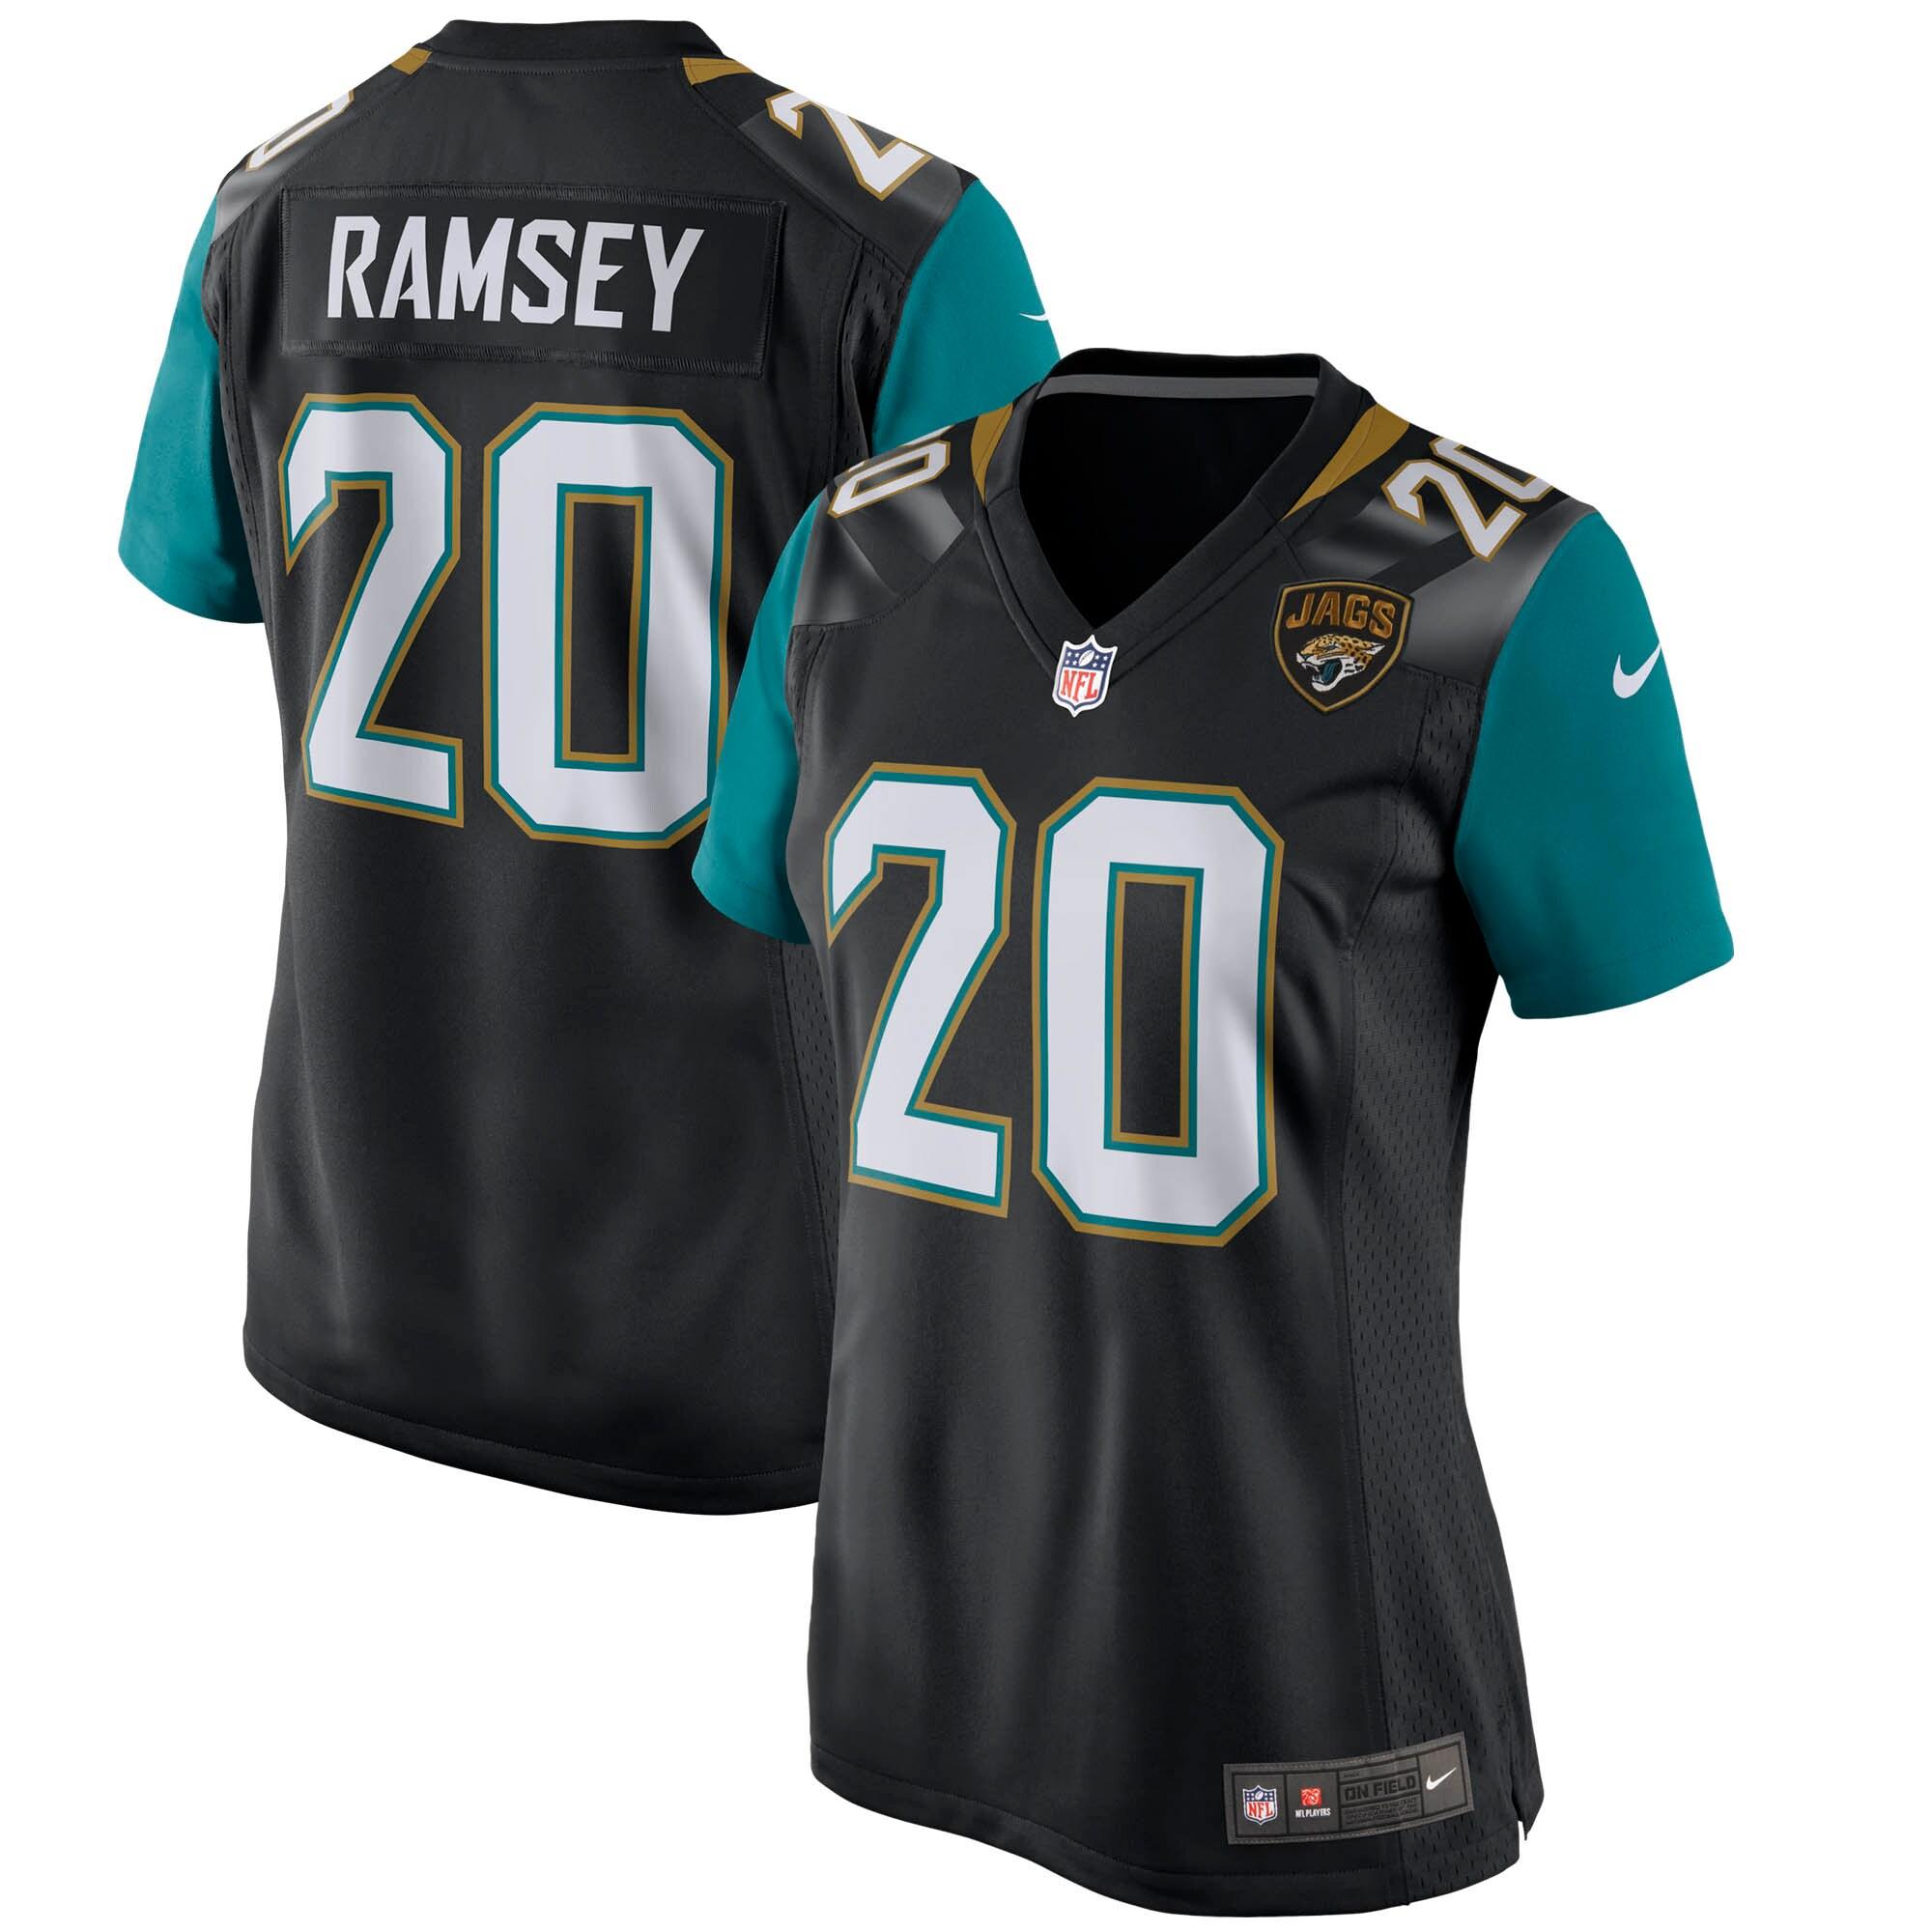 Jalen Ramsey Jacksonville Jaguars Nike Women's Game Jersey - Black